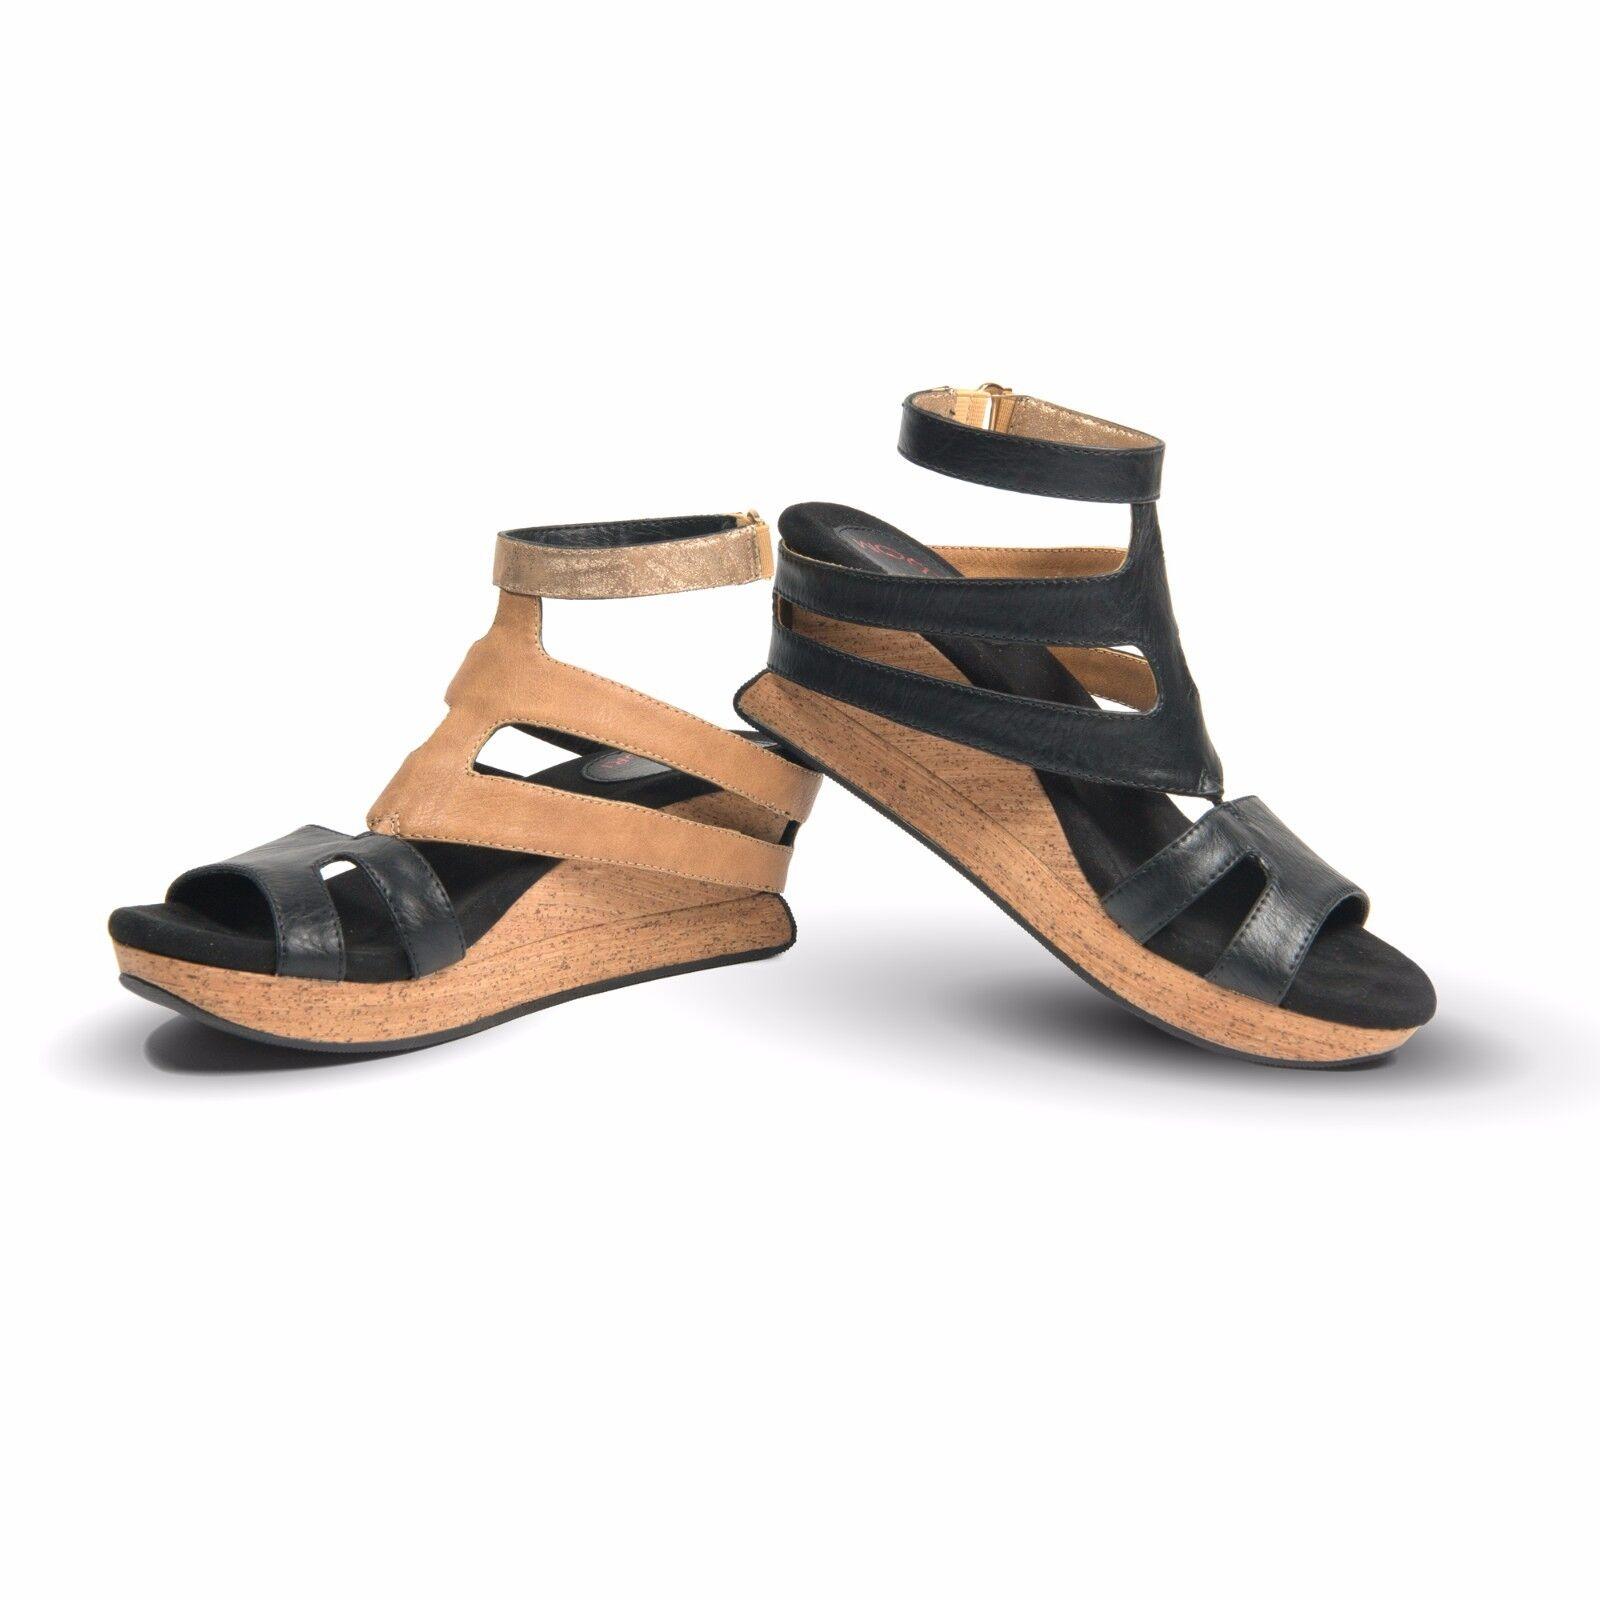 Modzori Modzori Modzori Fabia Women's Low Wedge Reversible Twister Sandal 5652f9